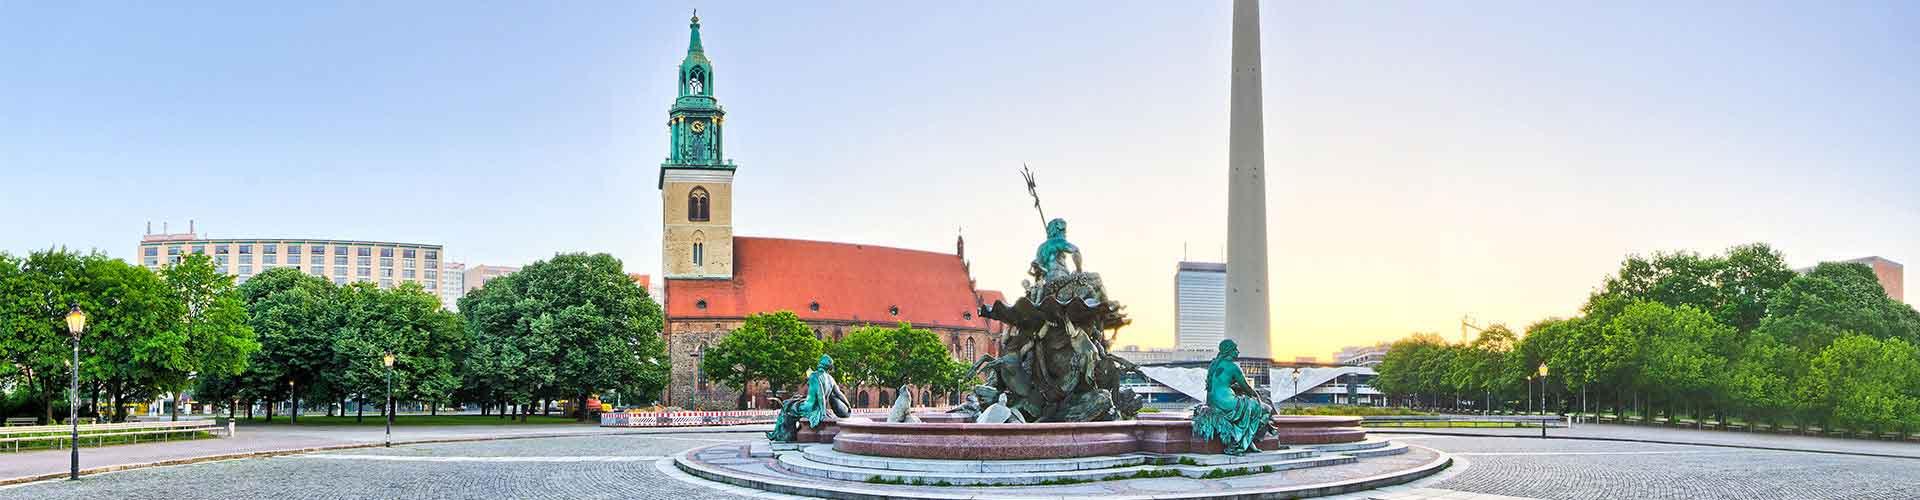 Berlín - Hostales cerca a Fernsehturm. Mapas de Berlín, Fotos y comentarios de cada Hostal en Berlín.